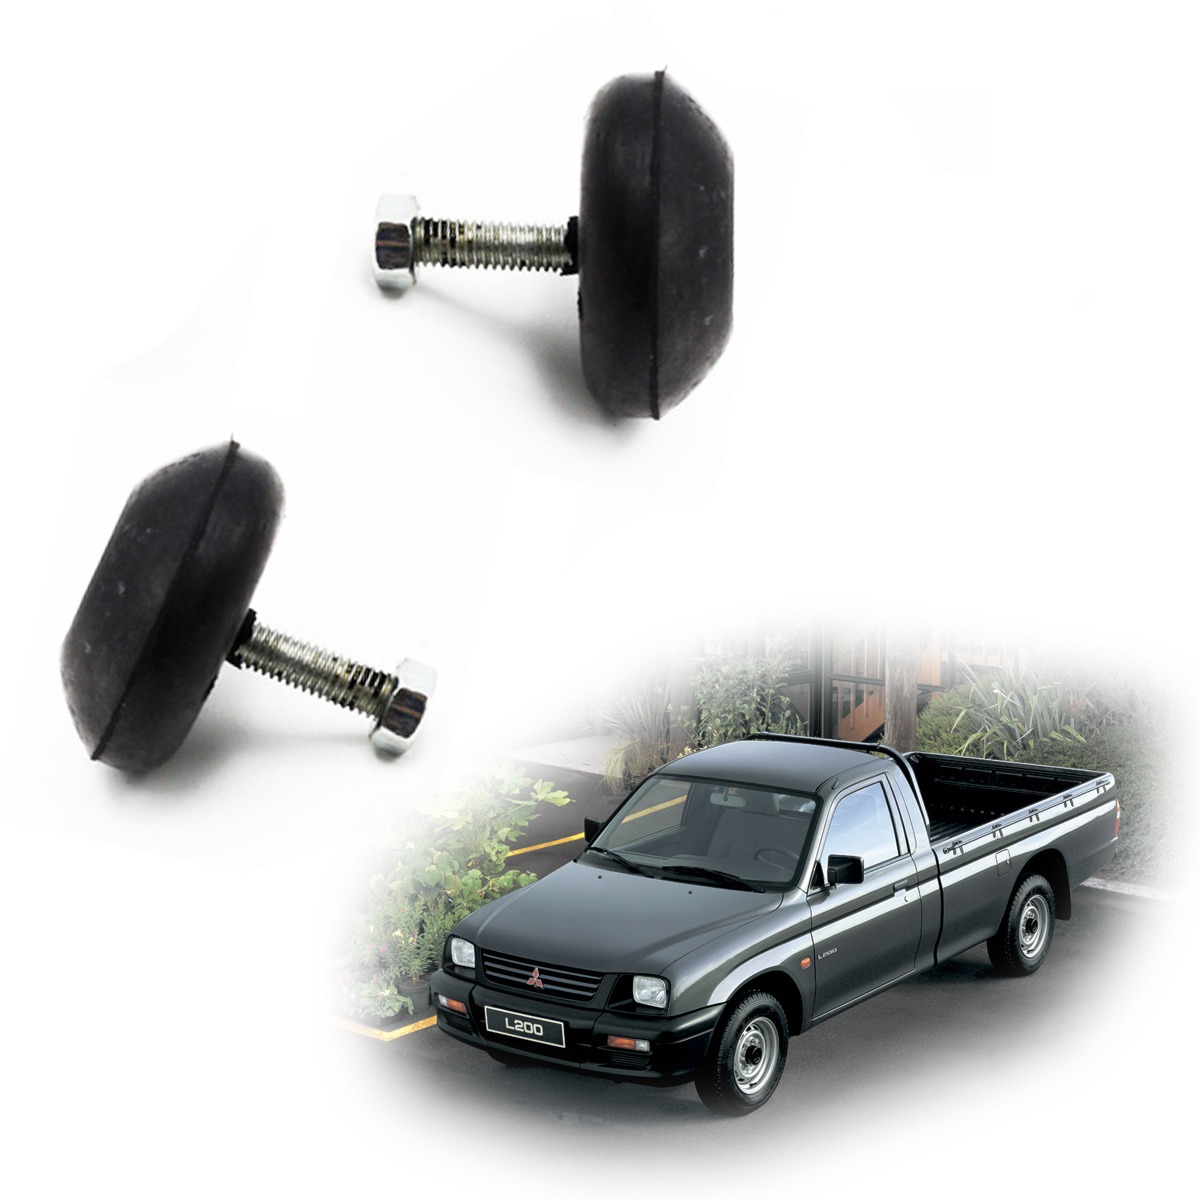 Front Hood Bonnet Bumper Rubber For Mitsubishi L200 Cyclone Pickup 1986 1996